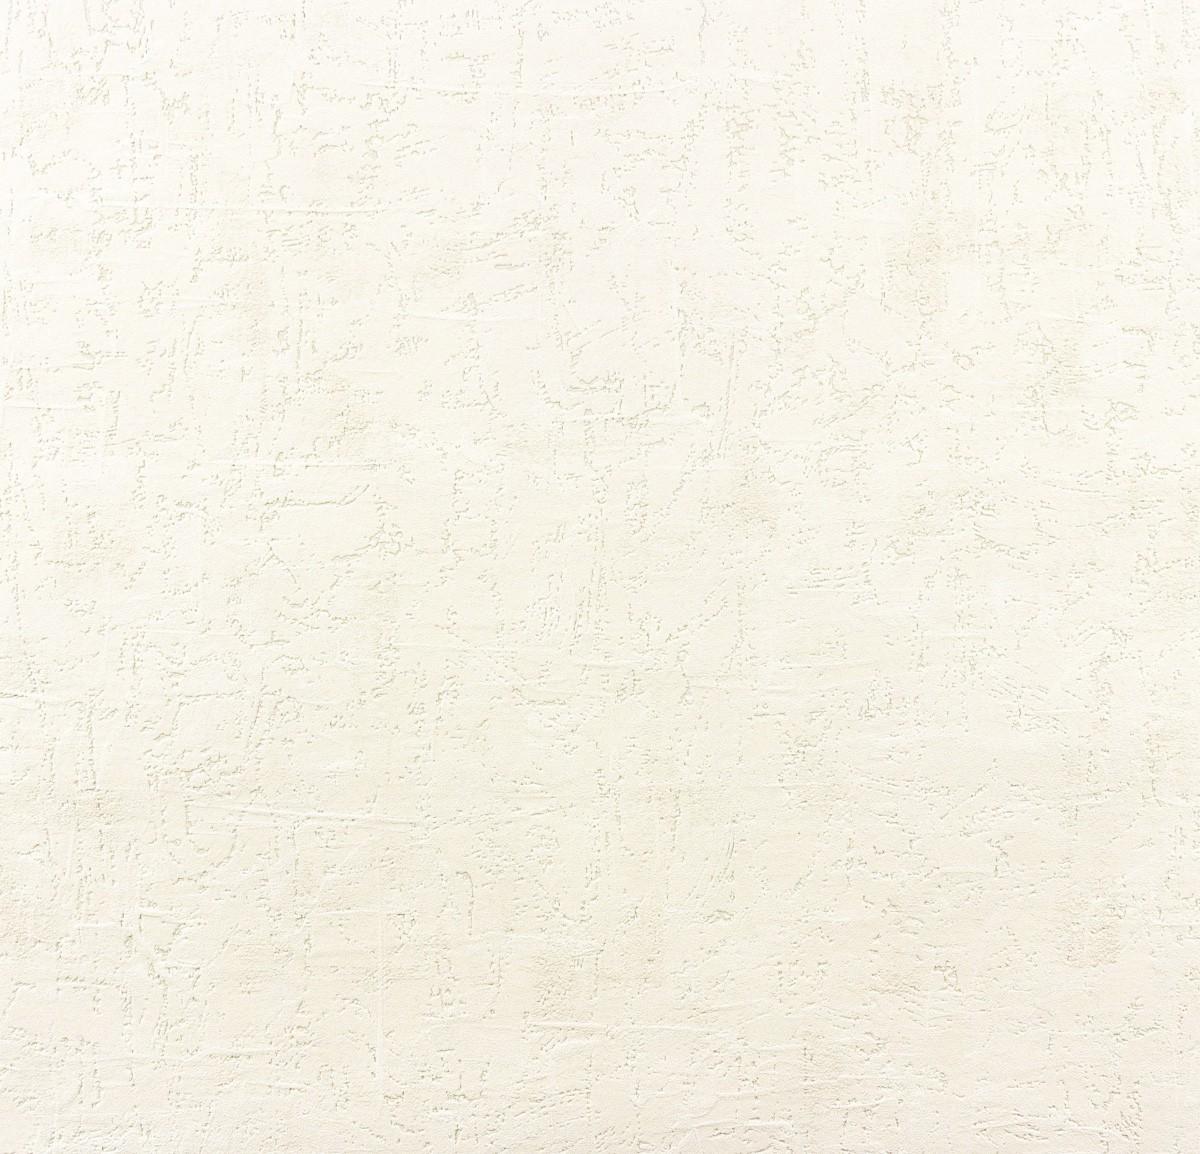 tapete uni steinoptik creme 5021 24 502124 ok 5 vliestapete a s. Black Bedroom Furniture Sets. Home Design Ideas